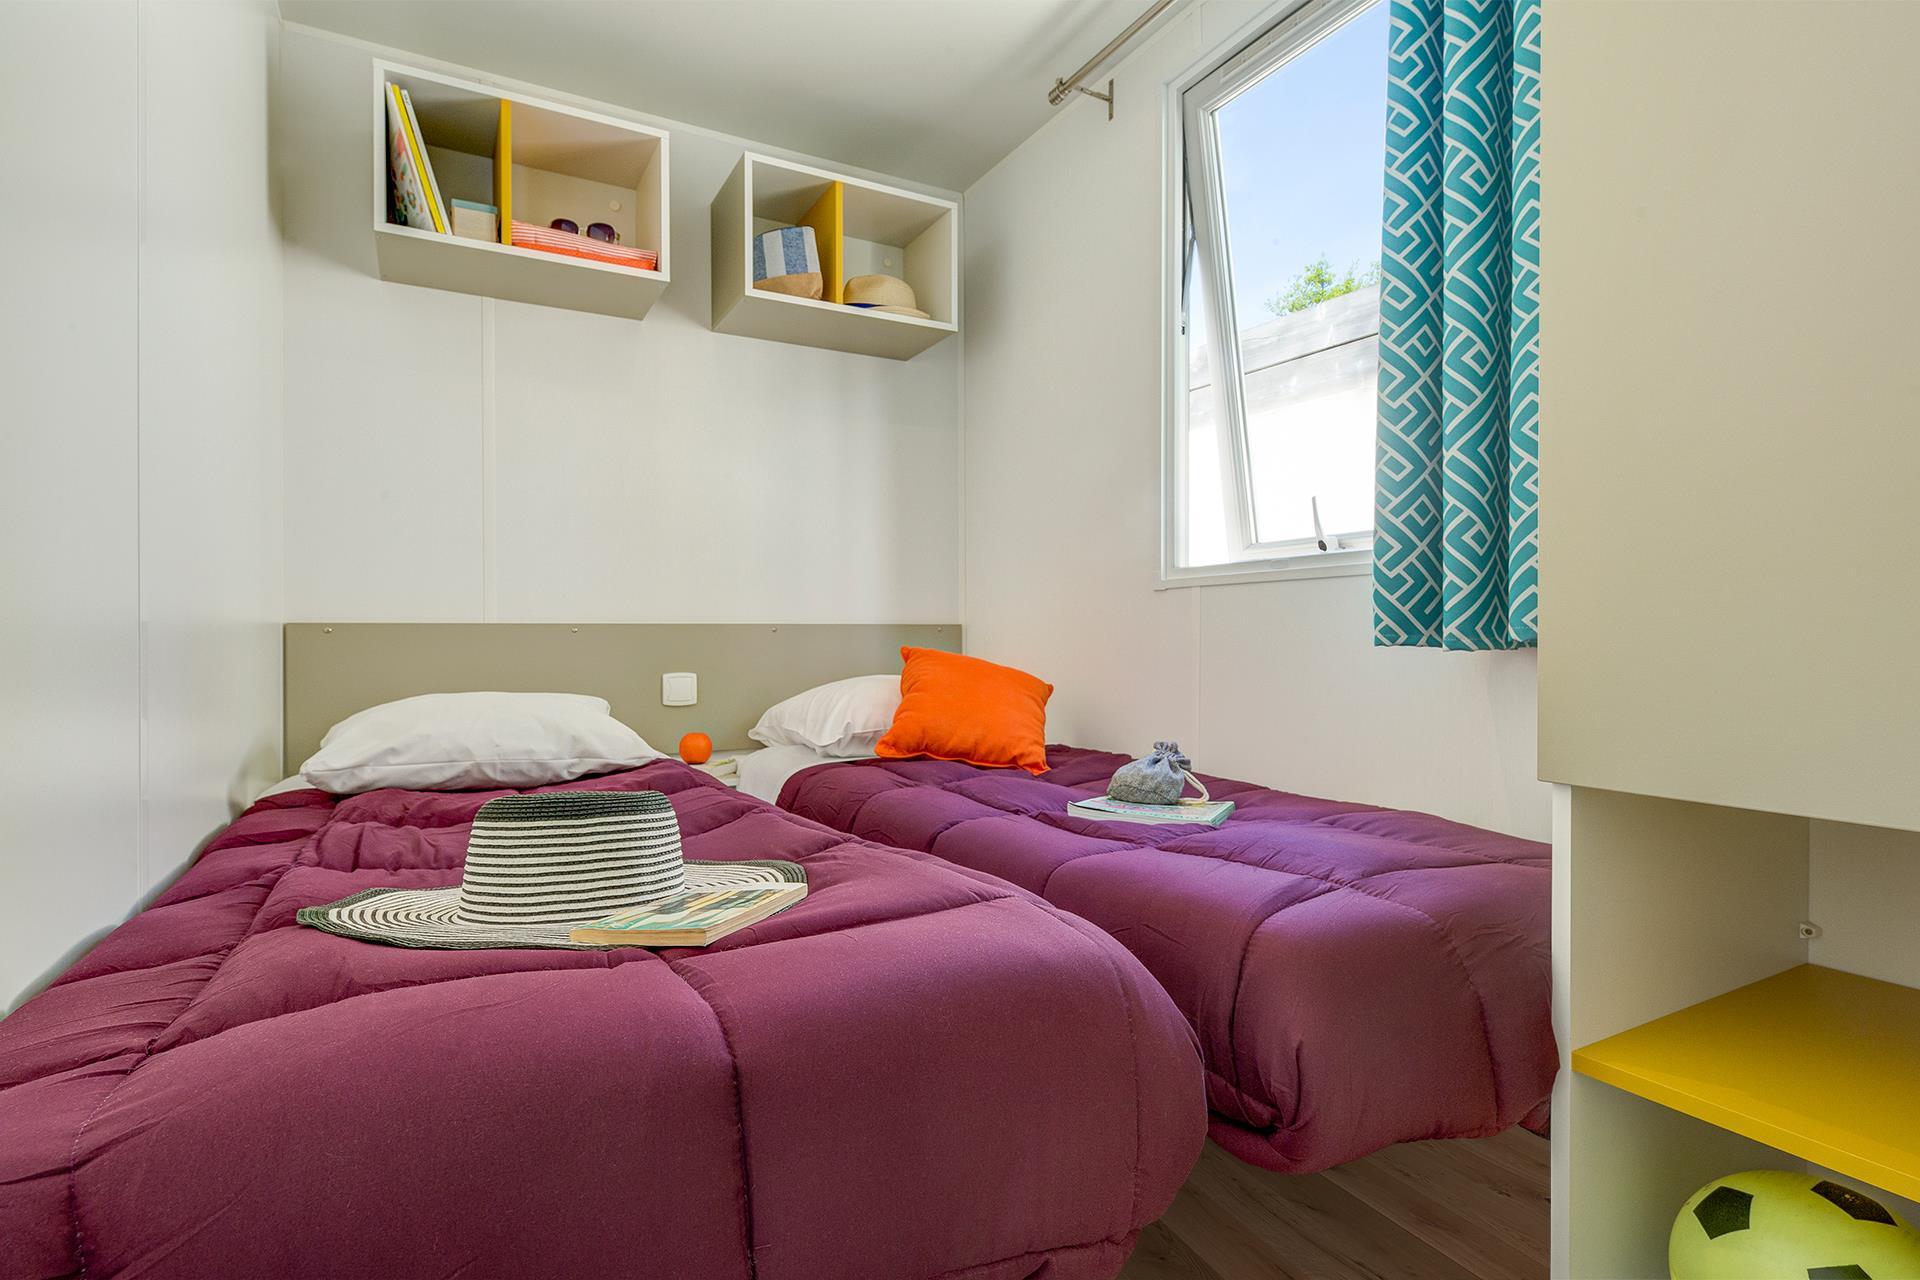 Location - Cottage 4 Chambres **** - Camping Sandaya L'Orée du Bois